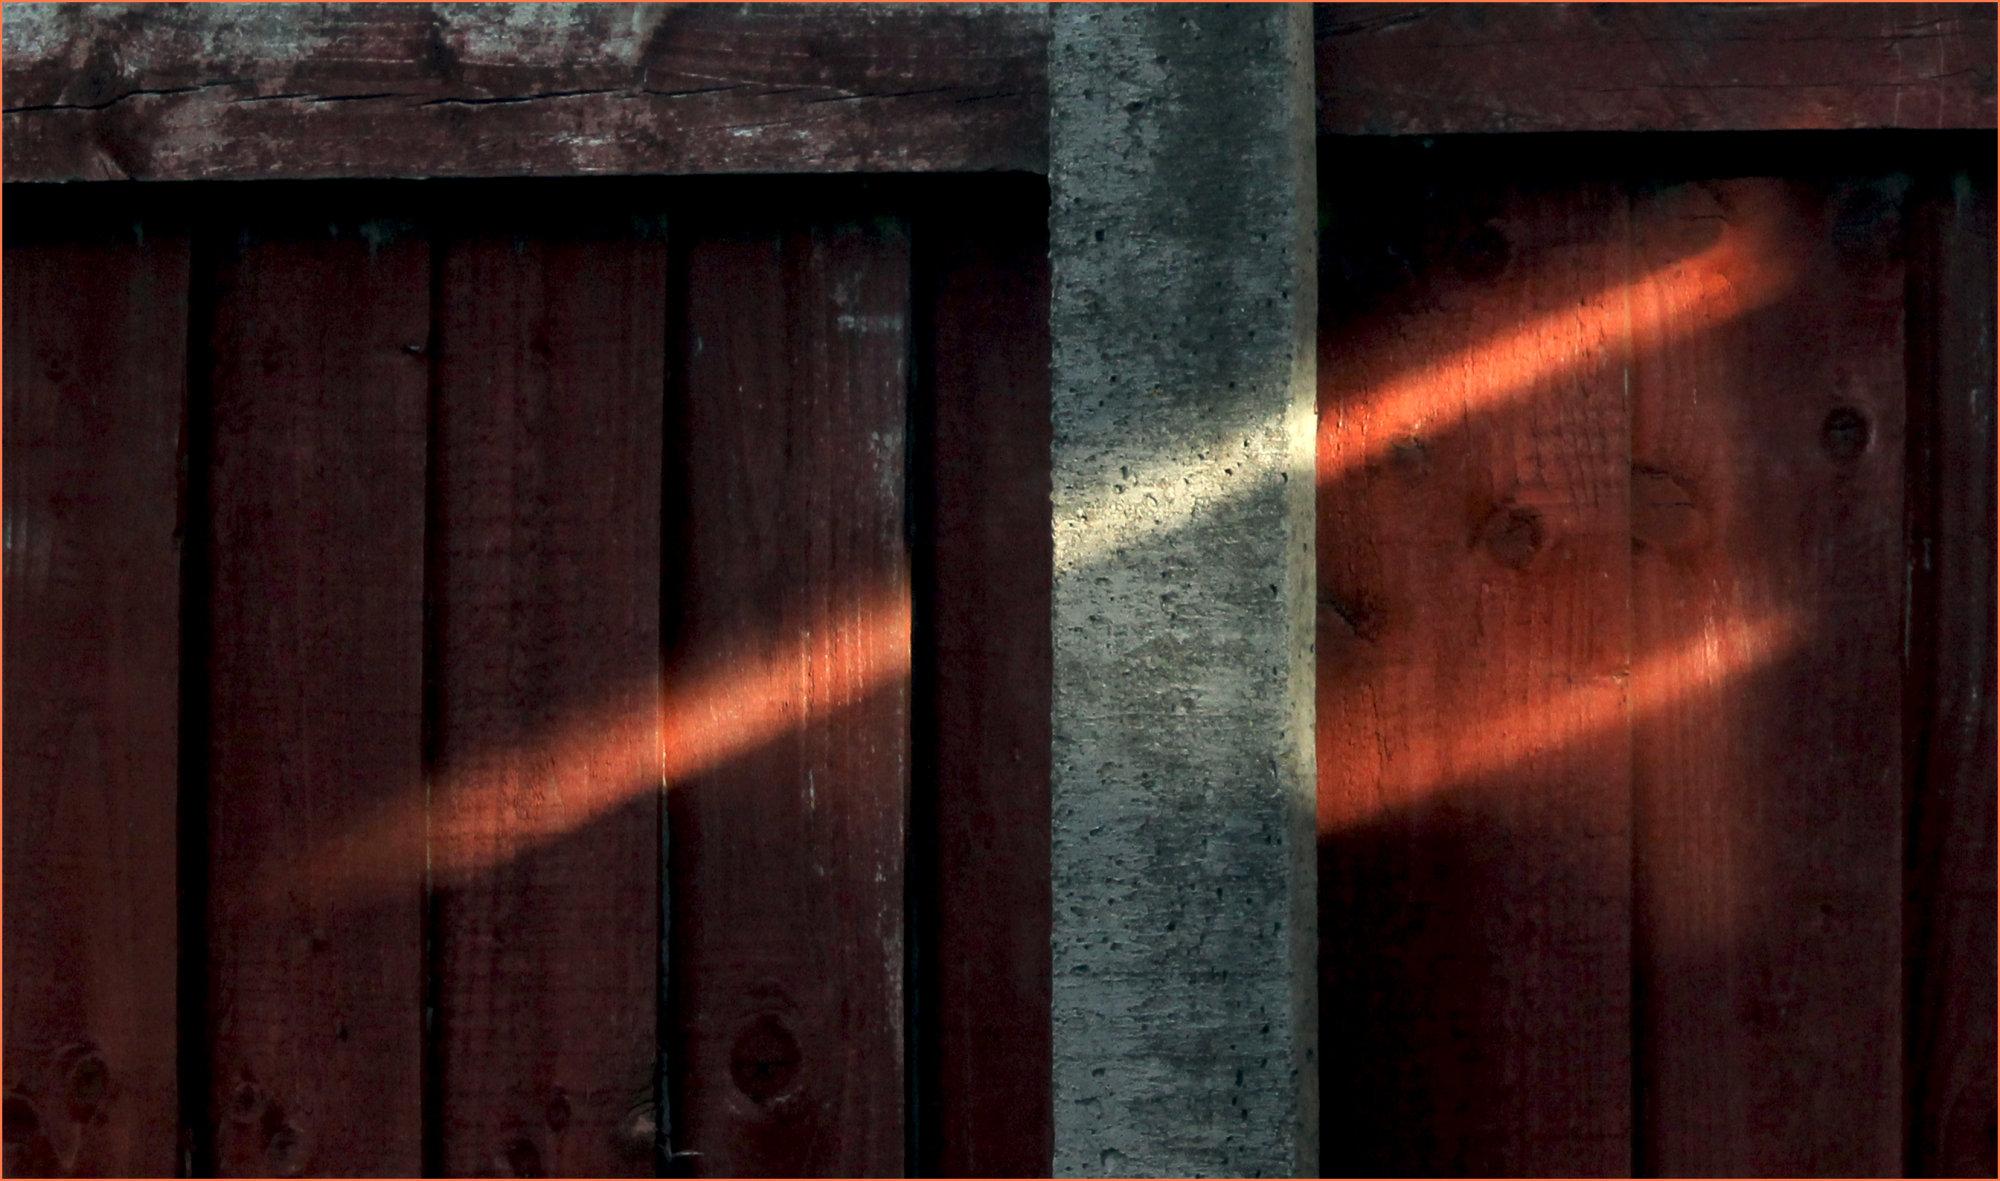 Last light on the garden fence